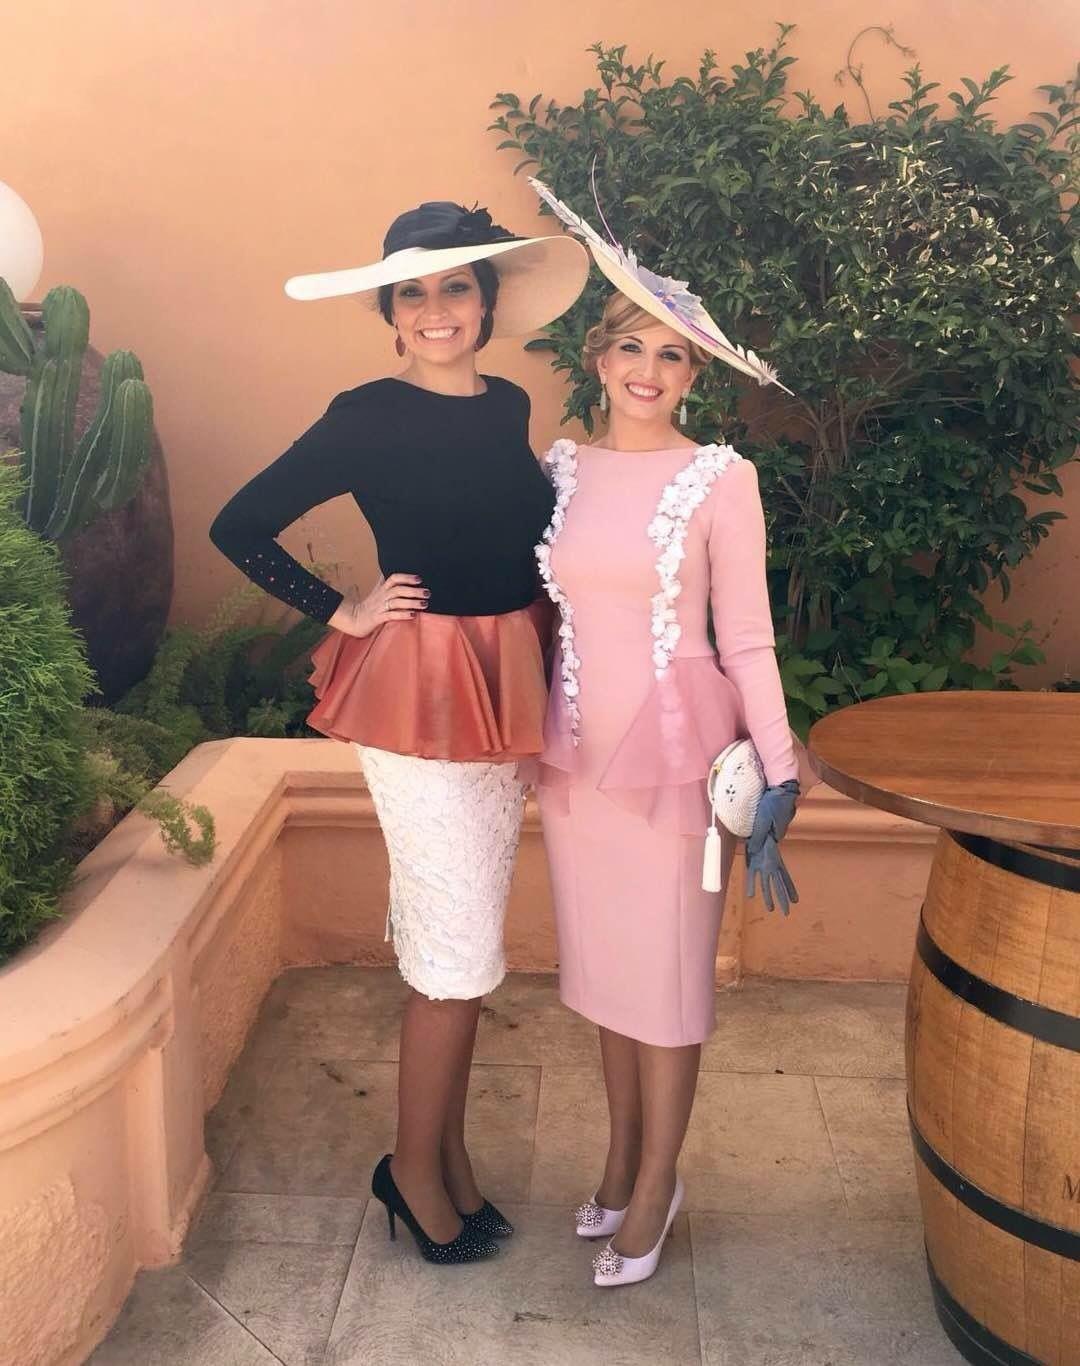 Pin de Estefania en Invitadas Perfectas   Pinterest   Vestido de ...